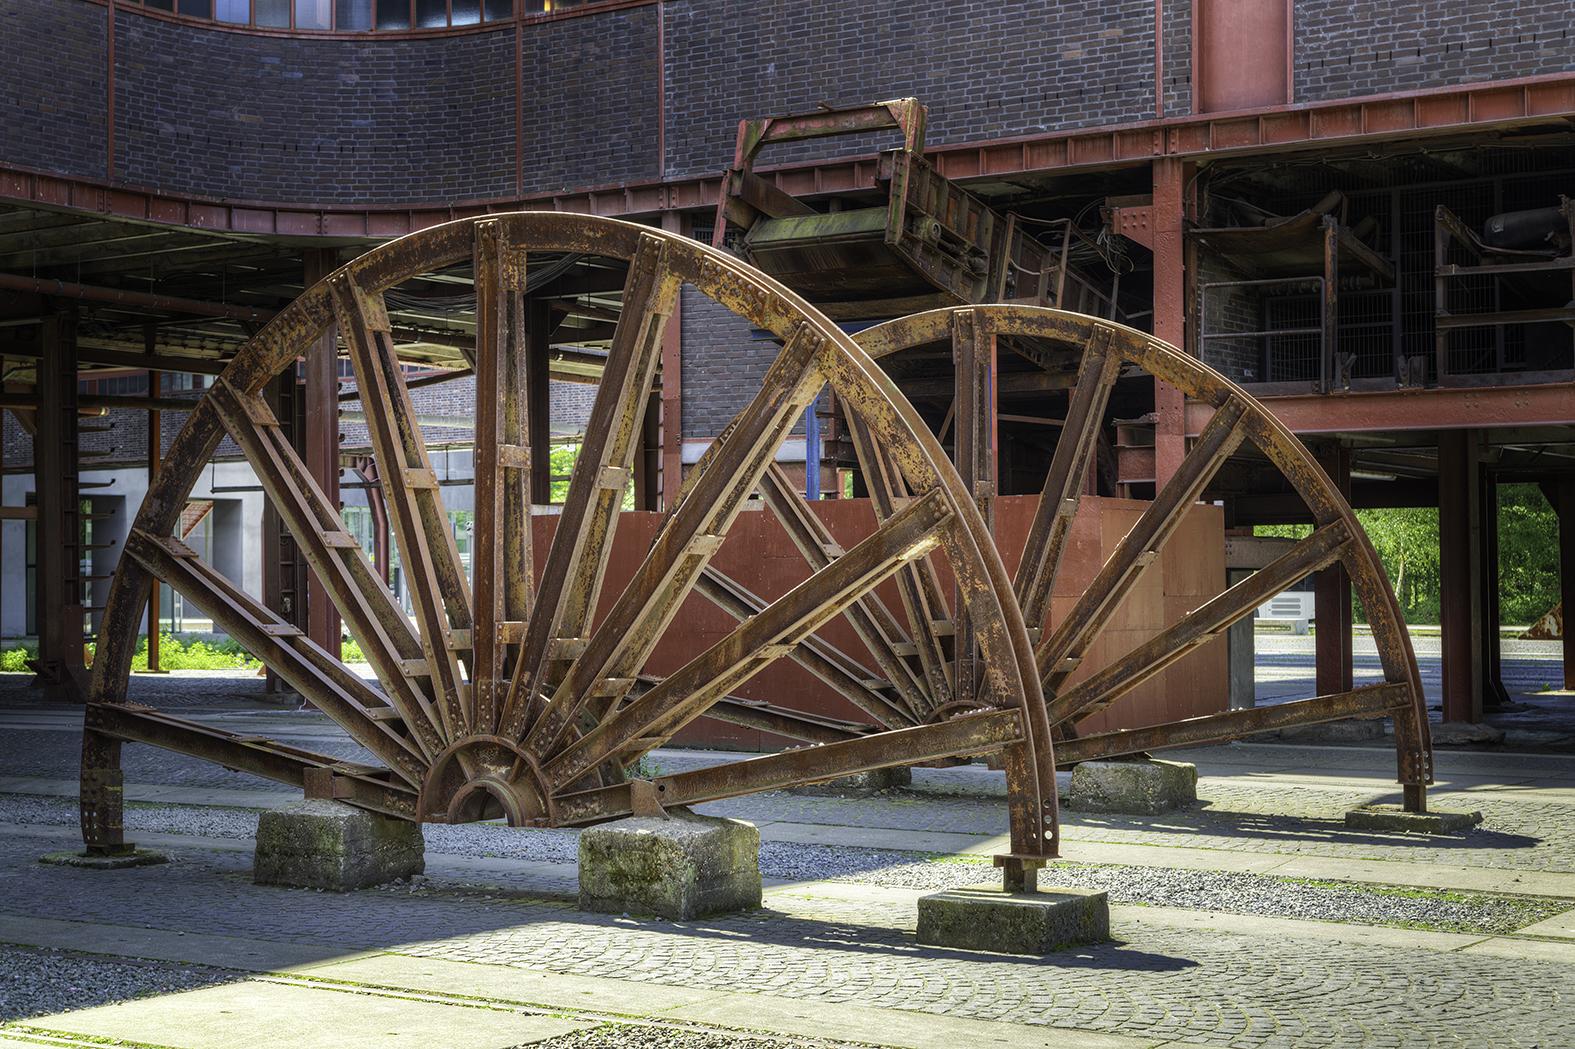 033 Zeche Zollverein.jpg